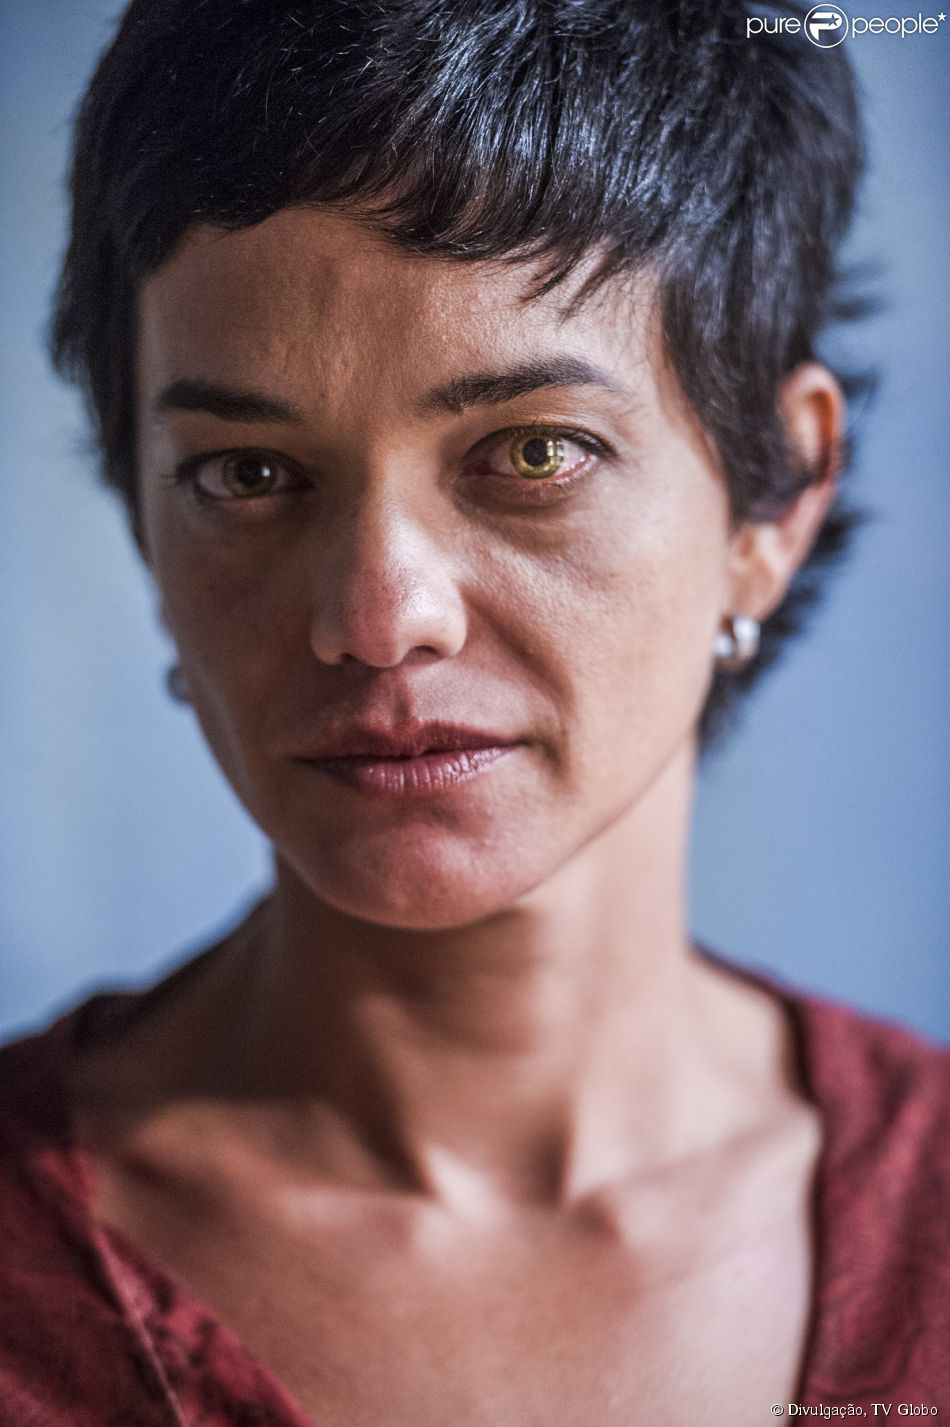 Ana Cecília Costa Atriz joia rara': gaia (ana cecília costa) descobre que tem pouco